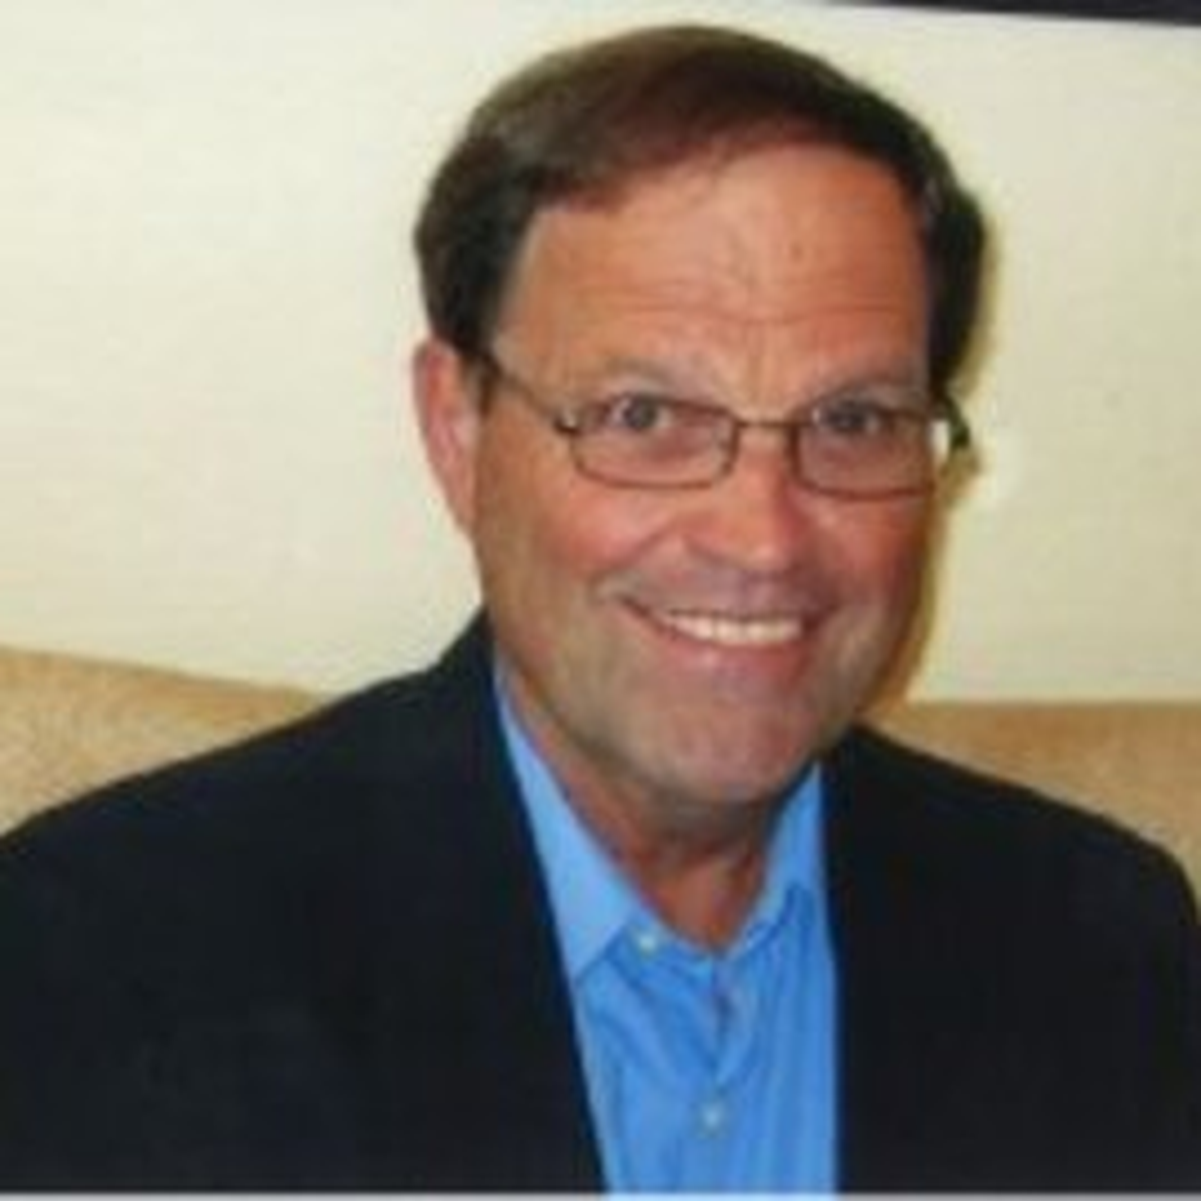 Thomas R. McFaul